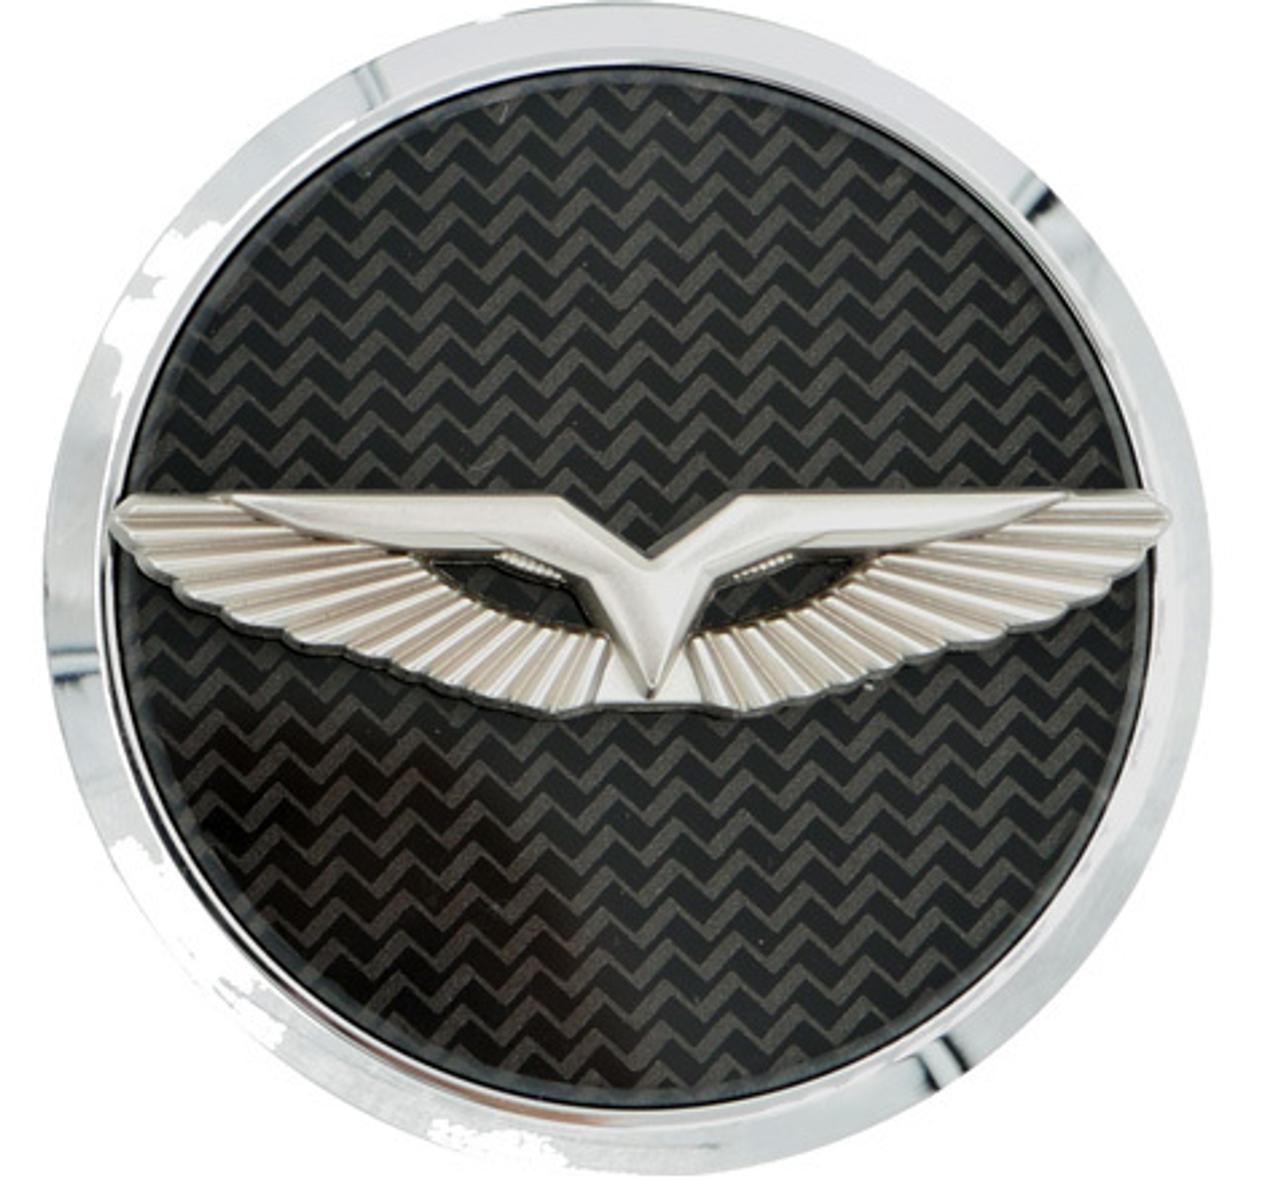 ANZU-T Steering Wheel Emblem for GM Models (4 Colors)